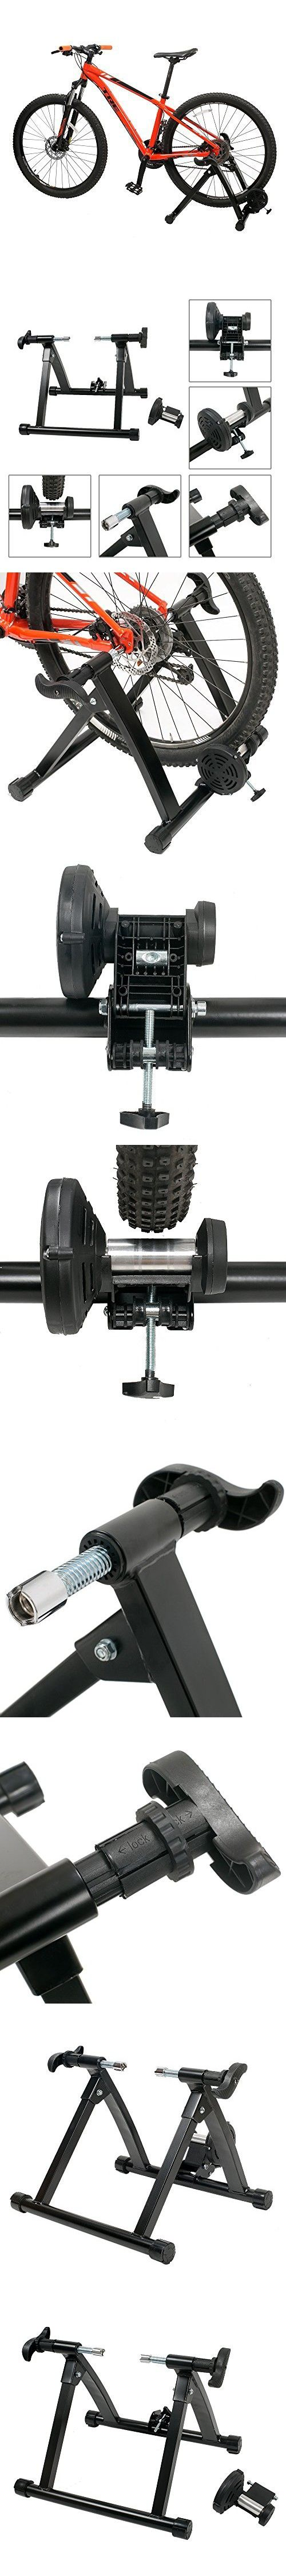 Docooler Magnet Steel Bike Bicycle Indoor Exercise Trainer Stand